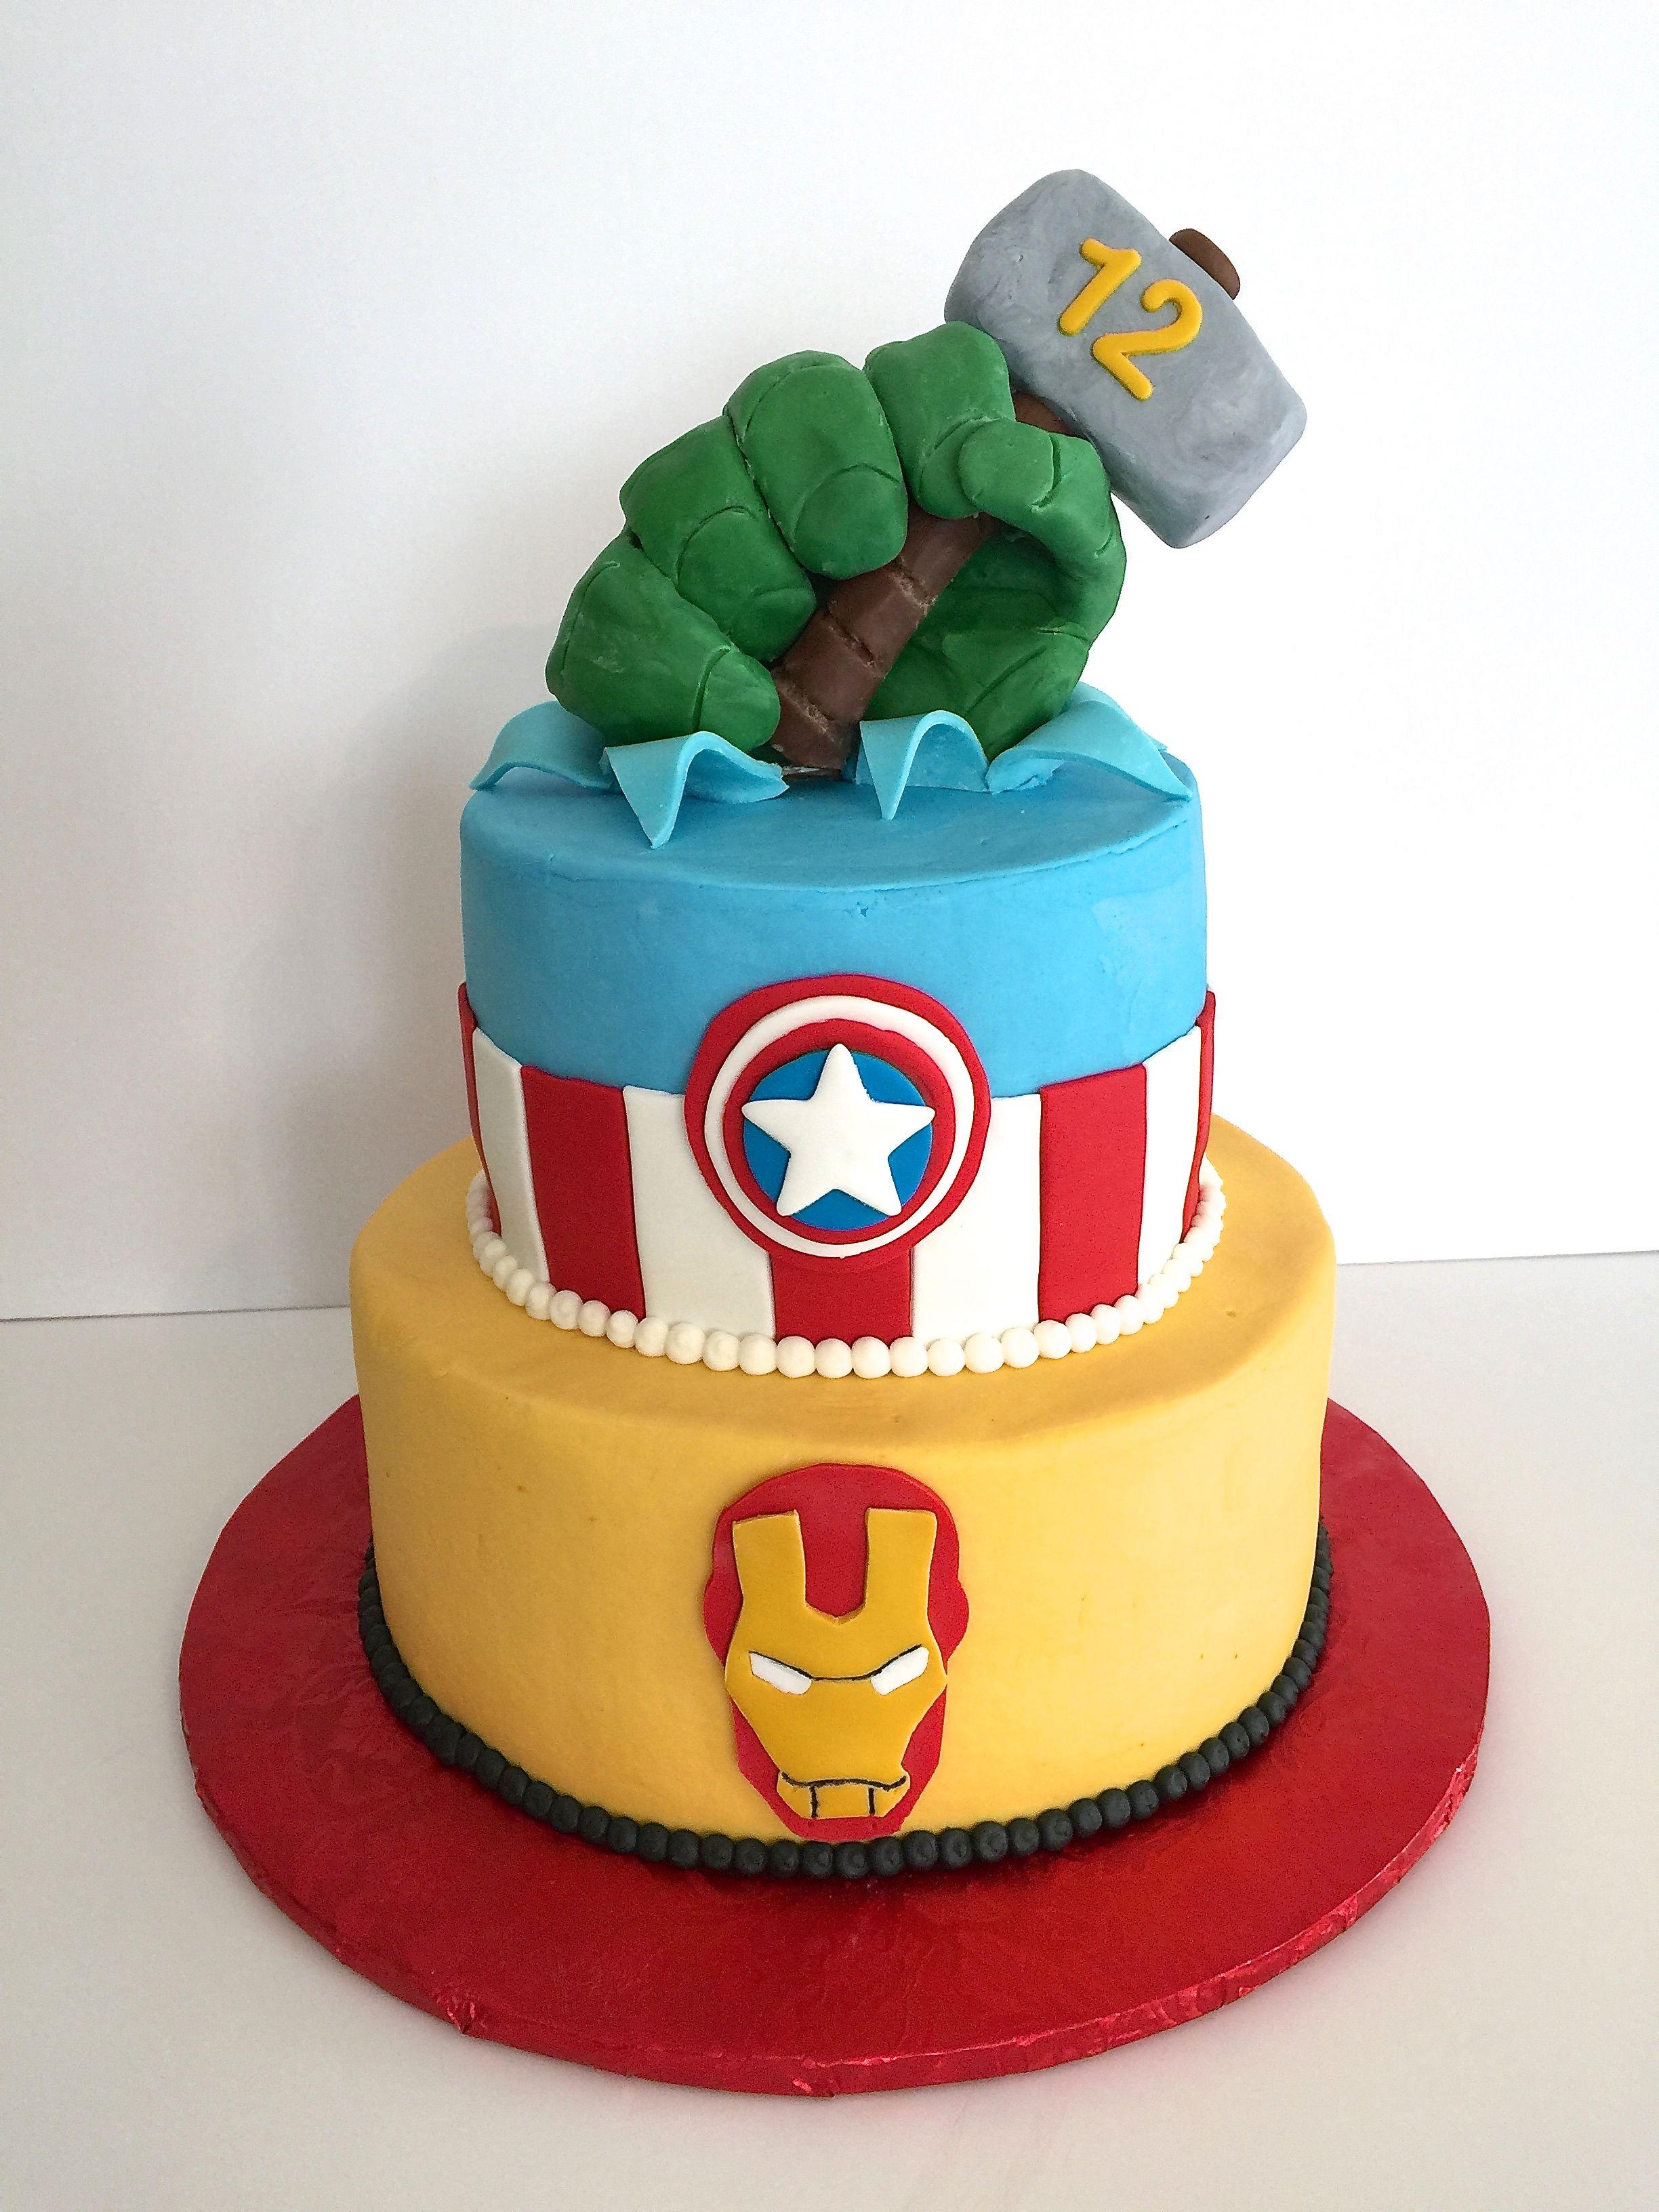 Avengers cake buttercream iced cake with fondant details I